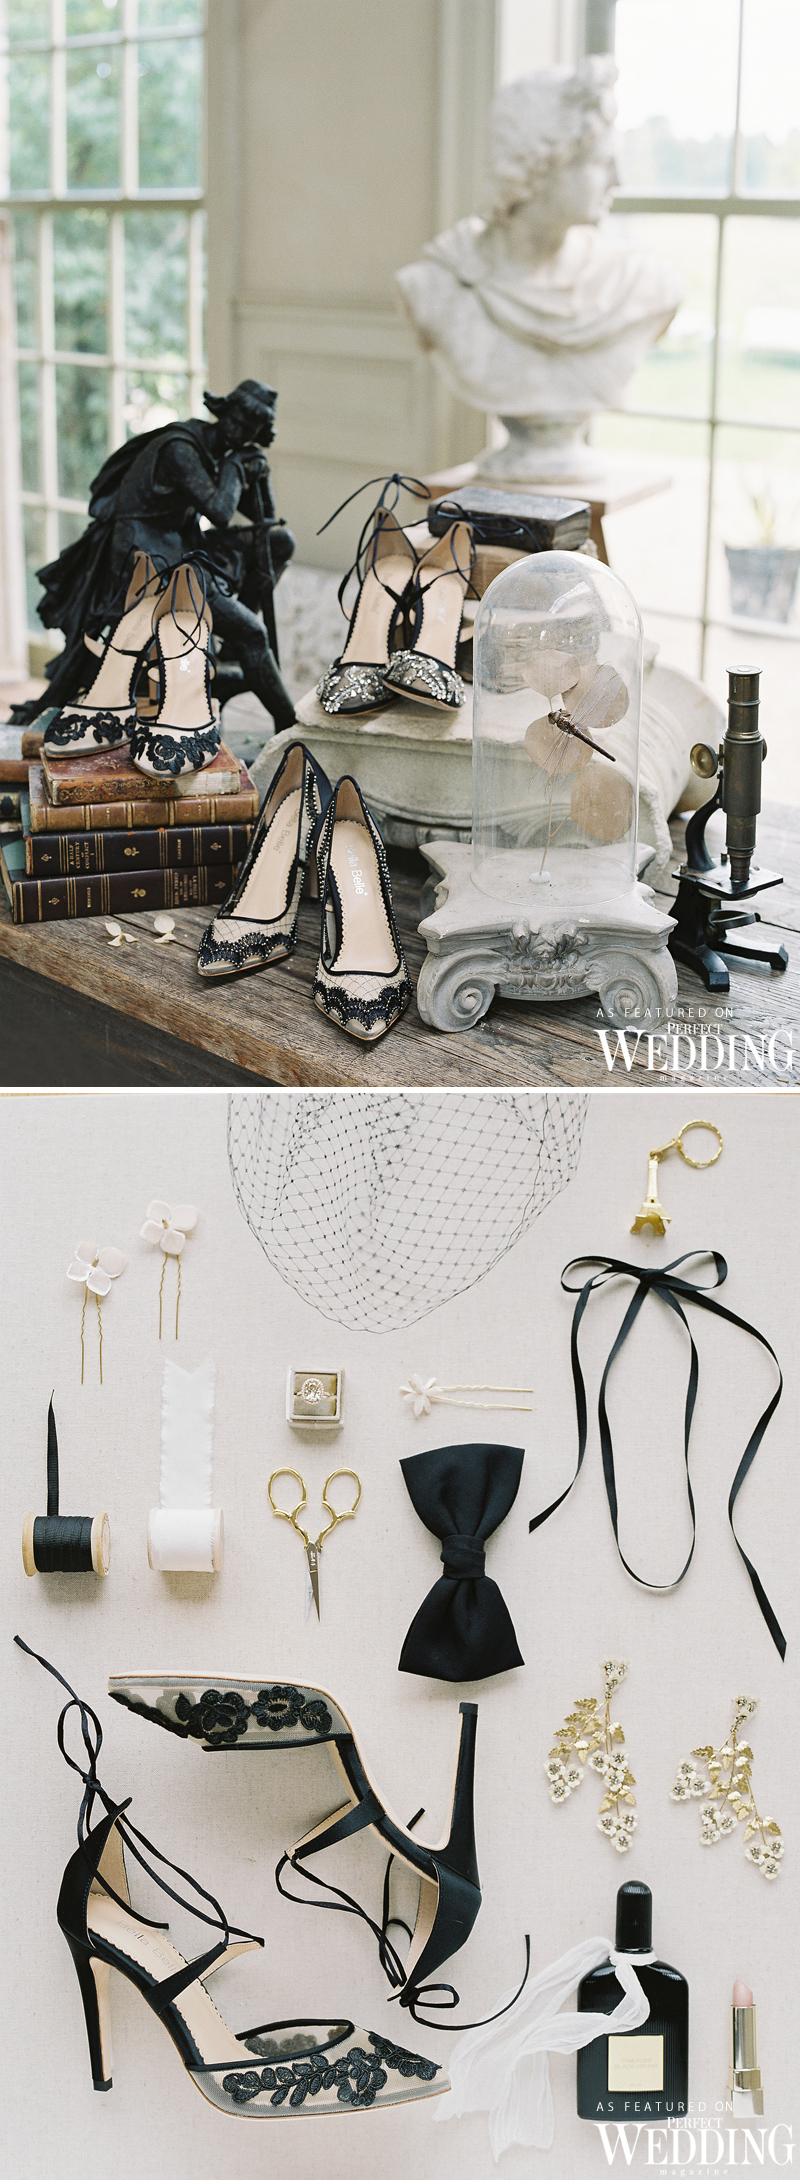 Bella Belle Shoes, Bella Belle Euphoria, Bella Belle 2018, Handmade Shoes, Bridal Shoes, Romantic Shoes, Perfect Wedding Magazine, Perfect Wedding Blog, Bridal Fashion, Bridal look